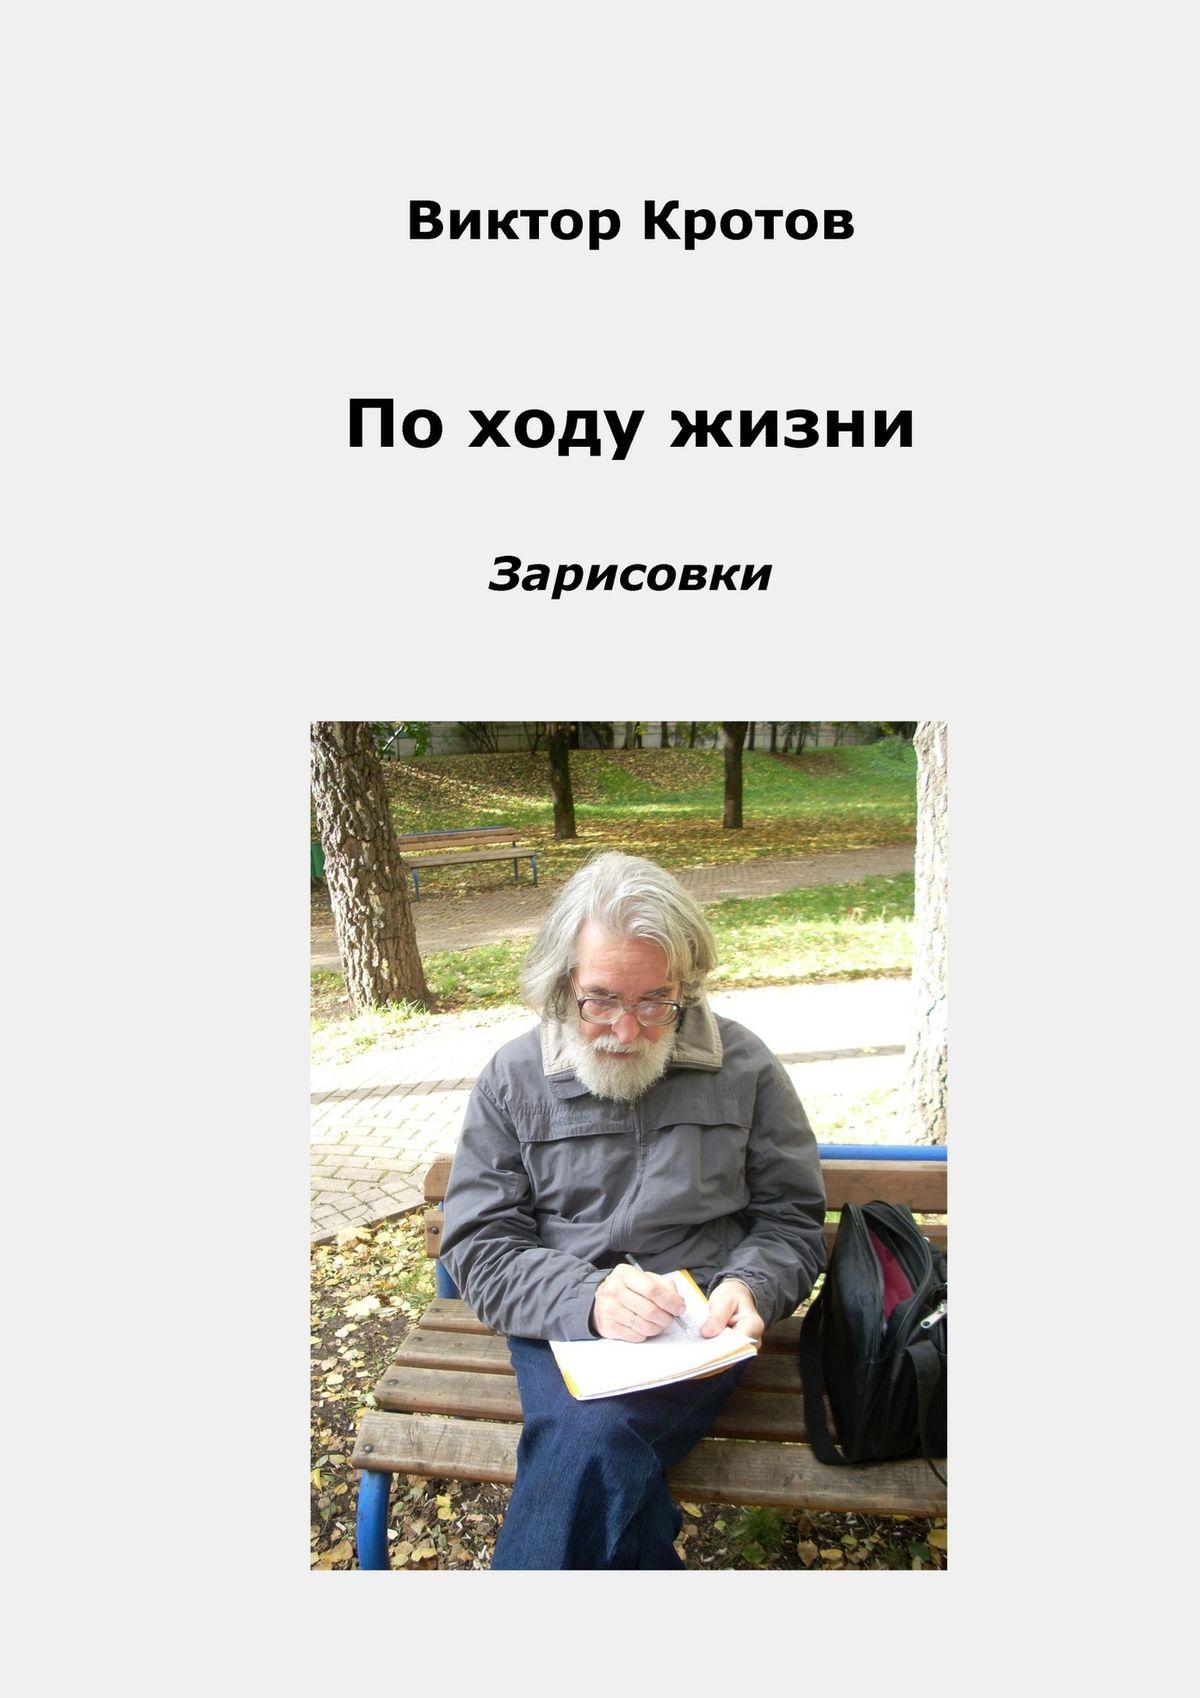 Виктор Кротов По ходу жизни. Зарисовки леонид трумекальн зарисовки по ходу